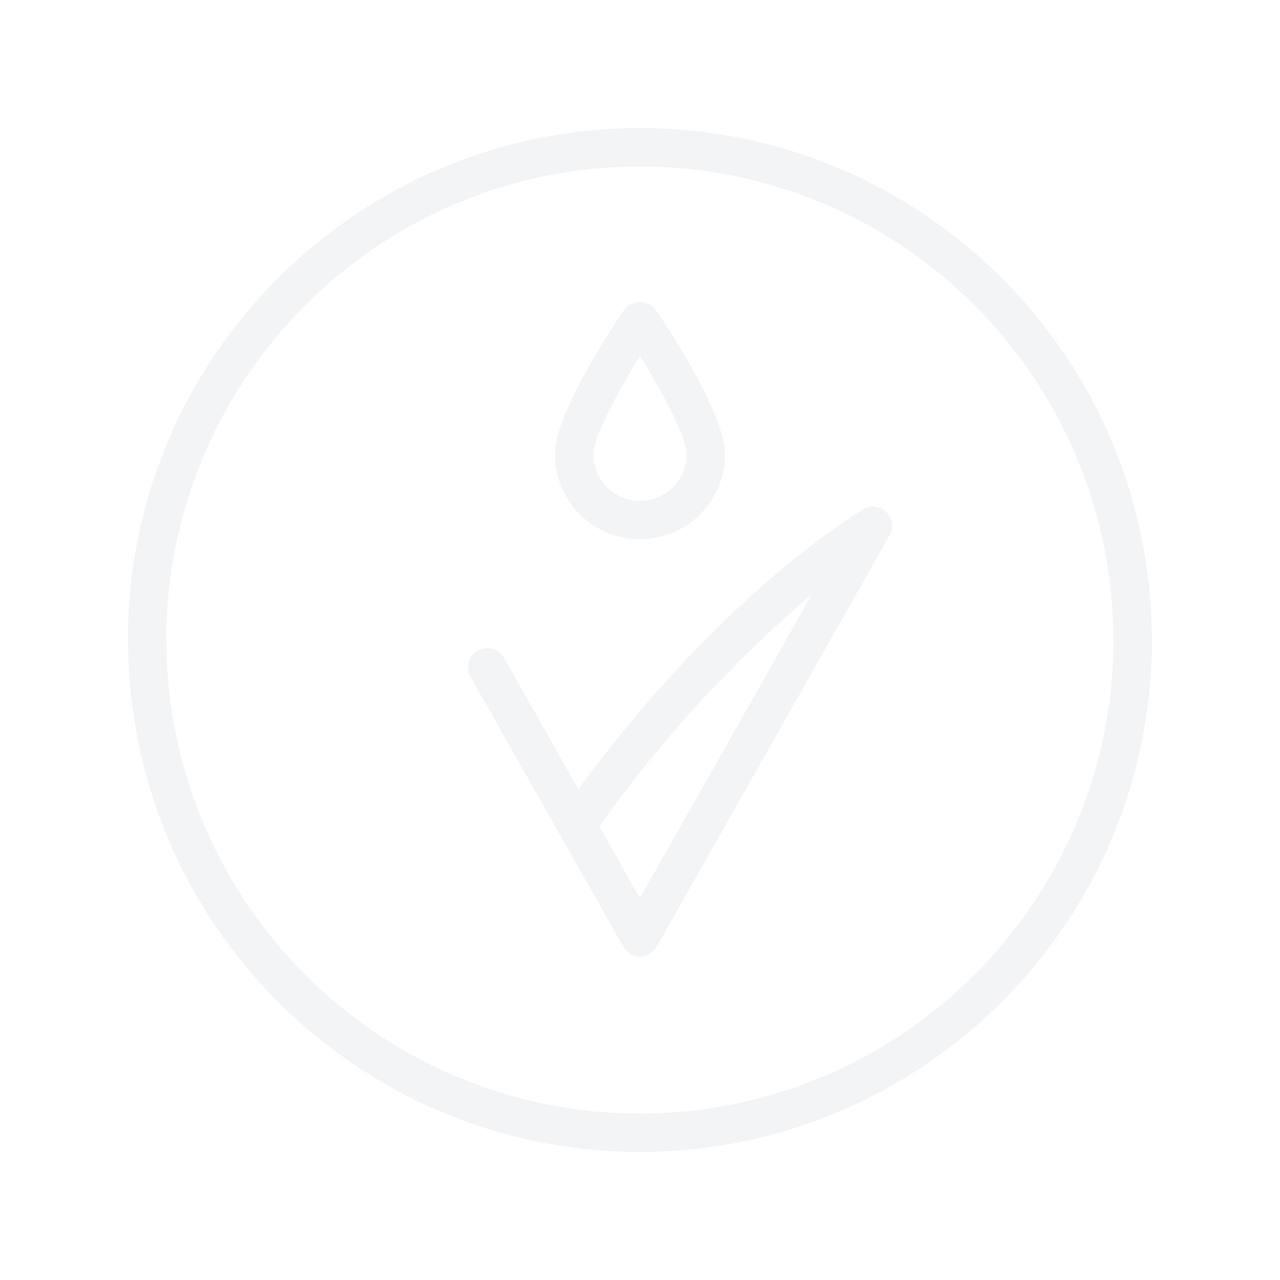 E.L.F. Aqua Beauty Molten Liquid Eyeshadow жидкие тени 2.6g